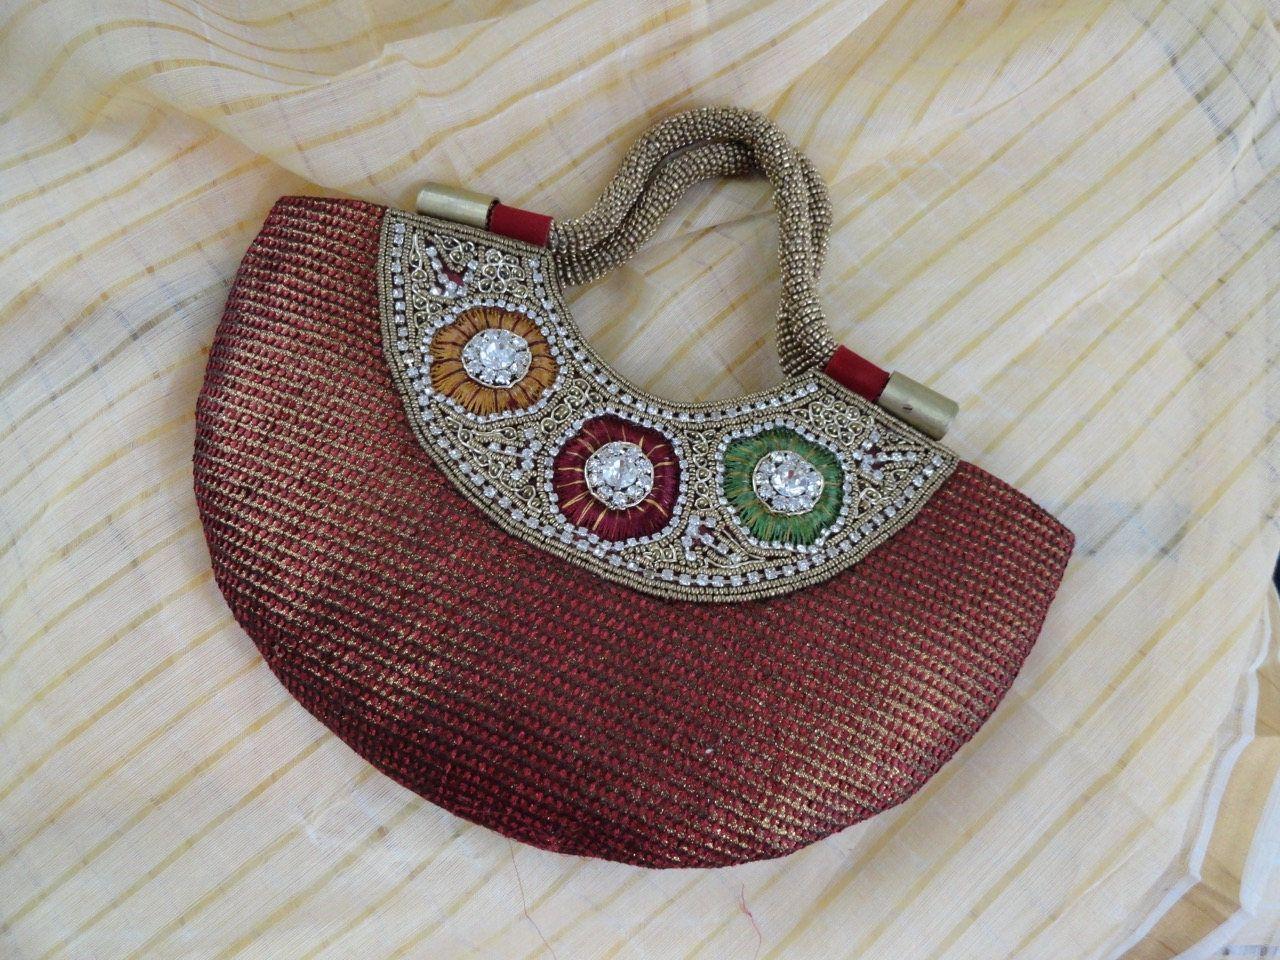 Silk Clutch Dressy Purse Handbag Indian Party Wedding Beads Sequin Wristlet From Artkrti By Artikrti On Etsy